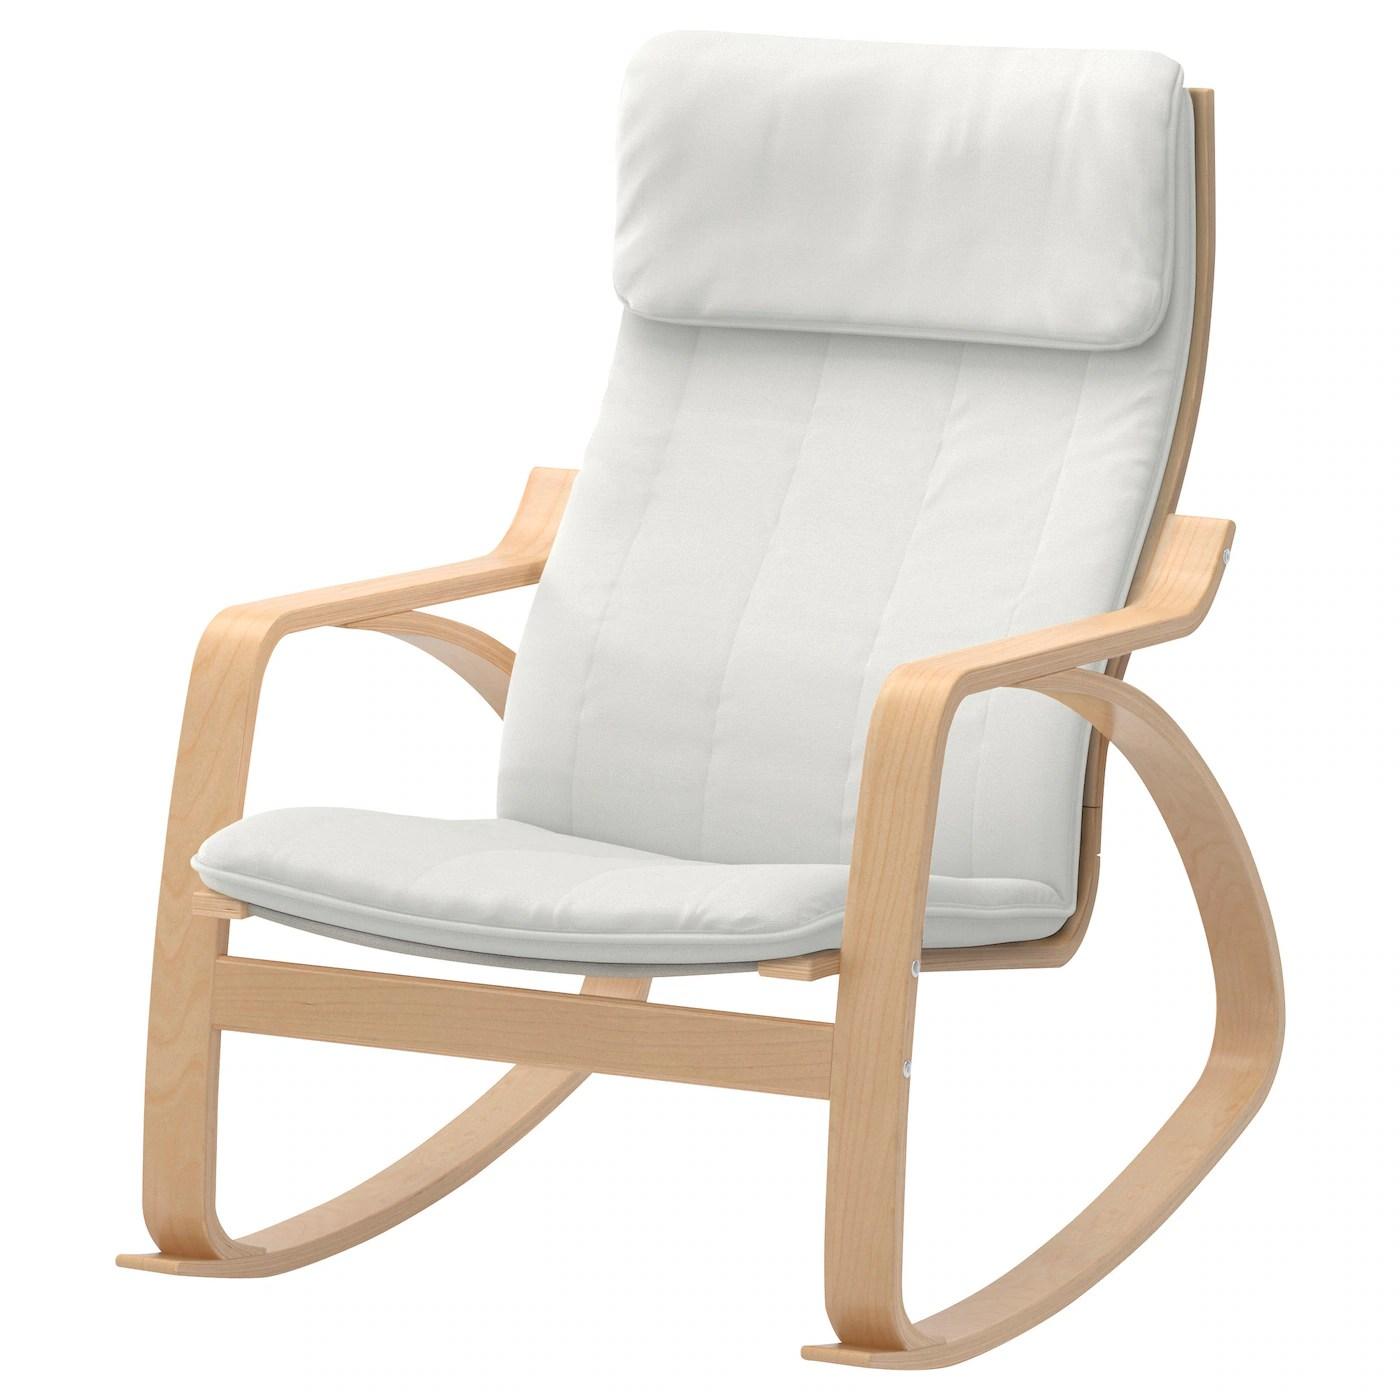 ikea rocking chairs accent ashley furniture poÄng chair birch veneer ransta natural